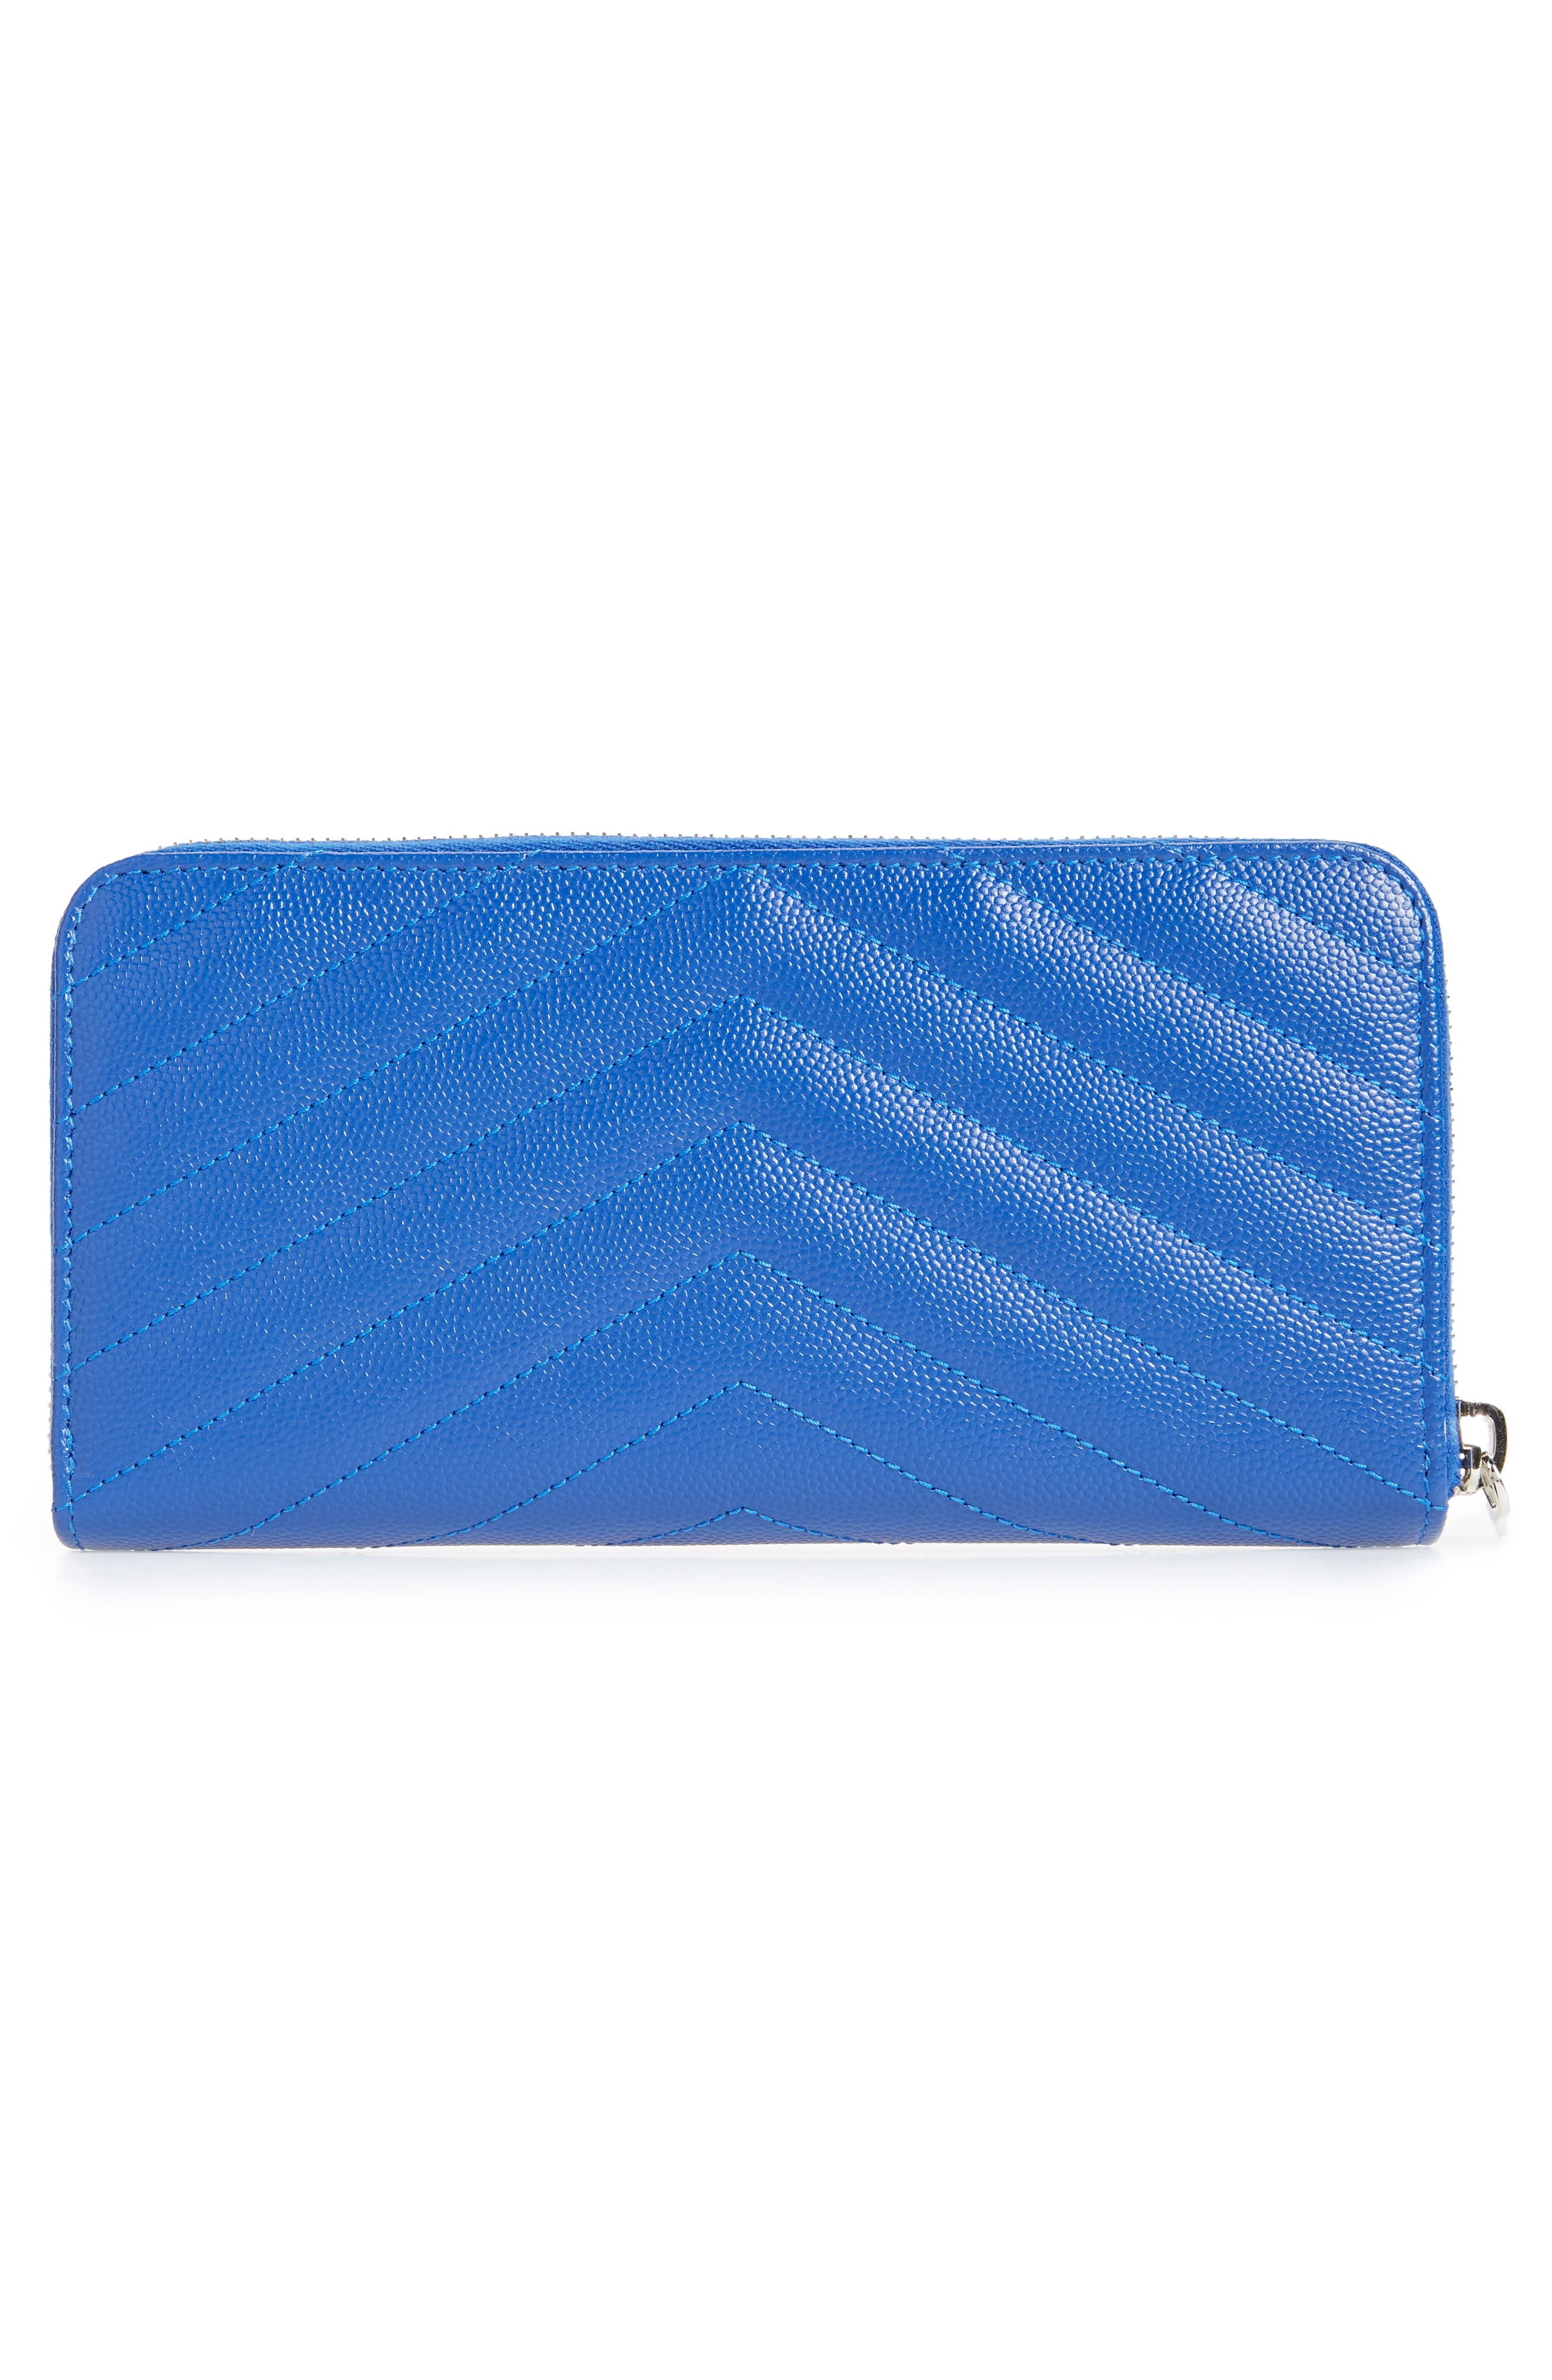 SAINT LAURENT,                             'Monogram' Zip Around Quilted Calfskin Leather Wallet,                             Alternate thumbnail 3, color,                             BRIGHT BLUE